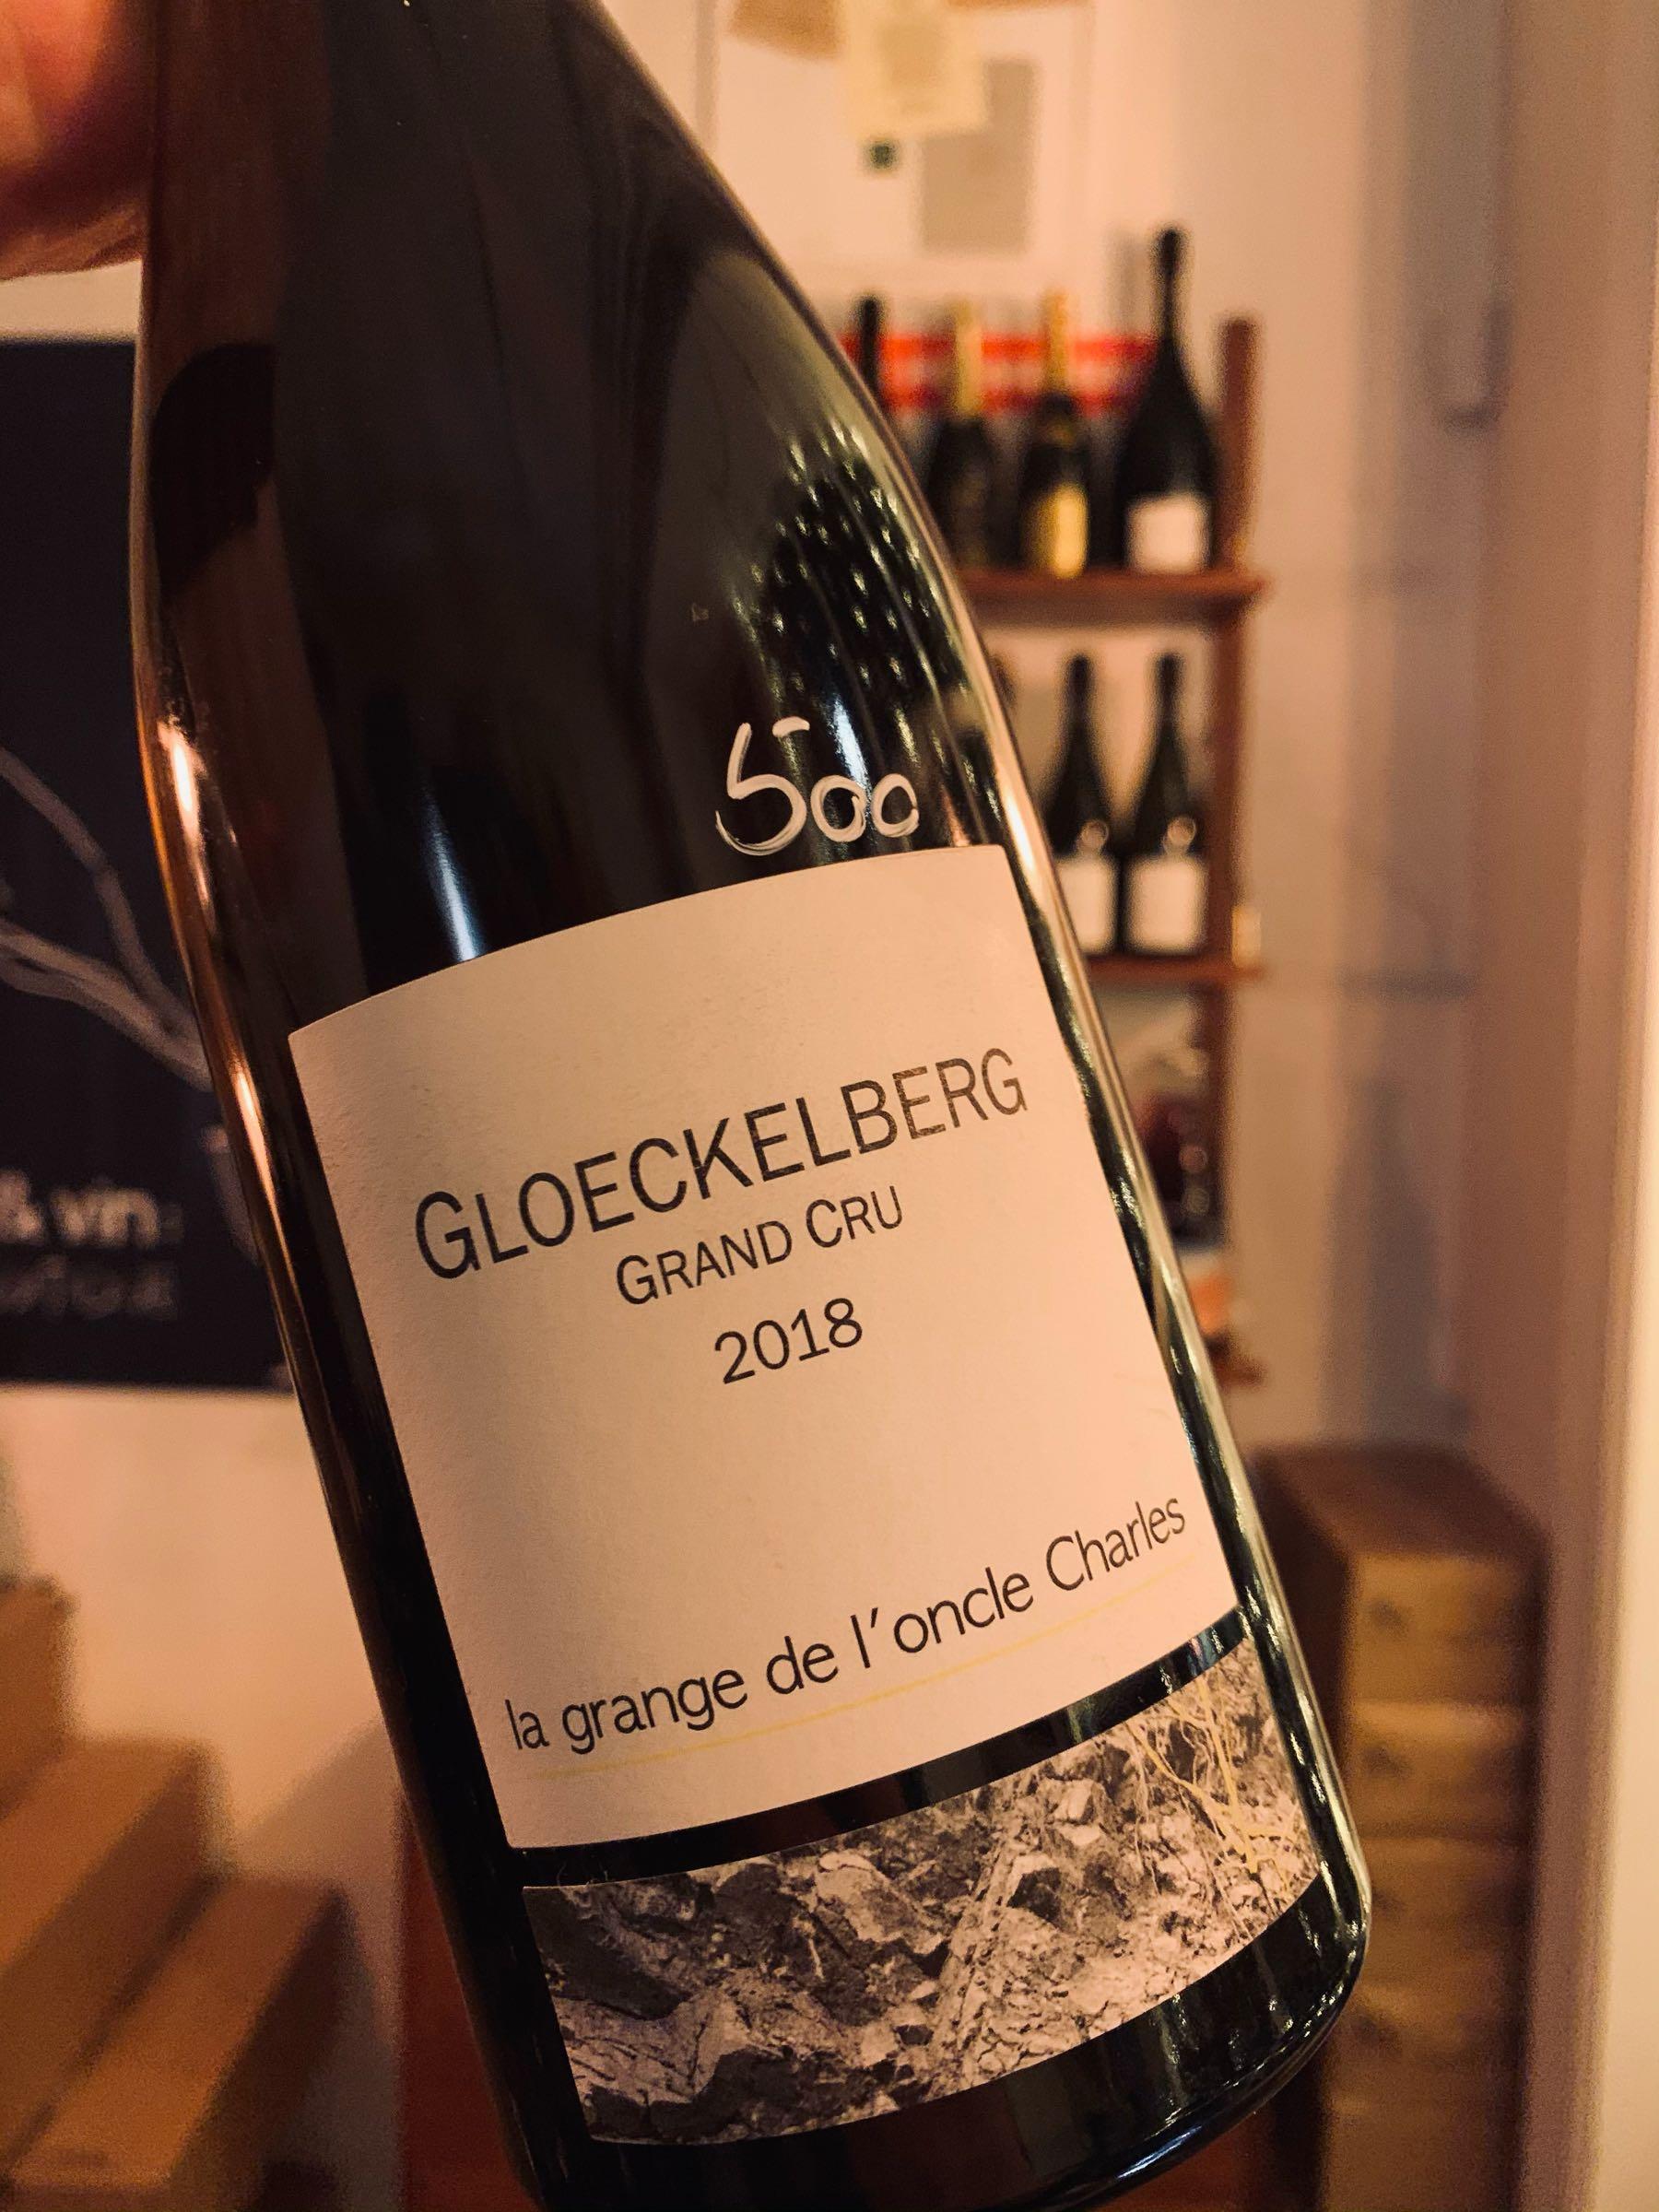 Gloeckelberg Grand Cru 2018 - Jerome Francois